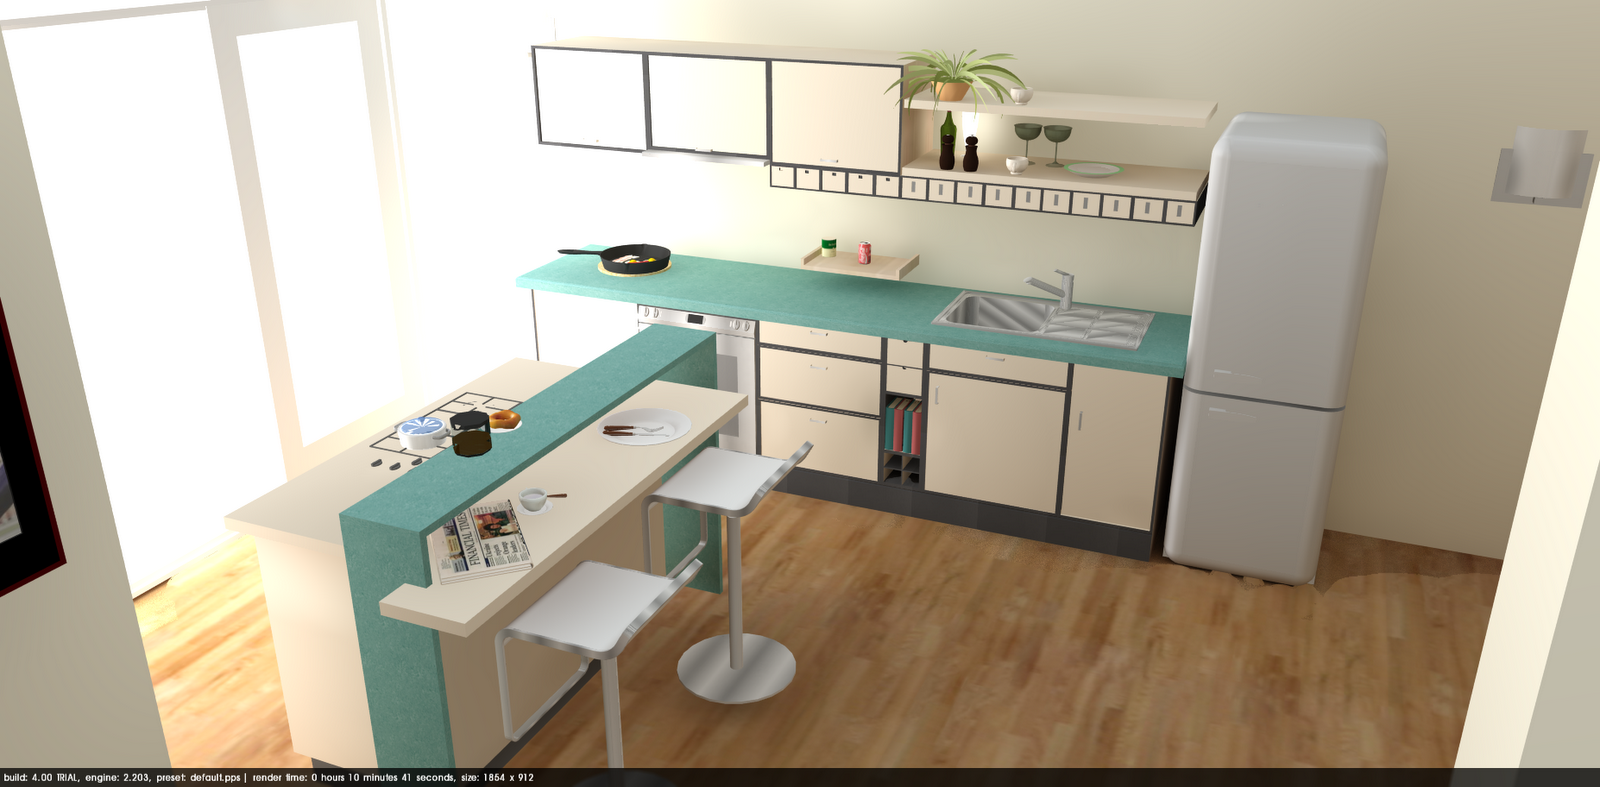 http://3.bp.blogspot.com/-31ijU4Nkq6Y/Tag-U24U_bI/AAAAAAAAAAw/fa3SZ5U_uKc/s1600/apartment+2011-03-30+23002200000.png